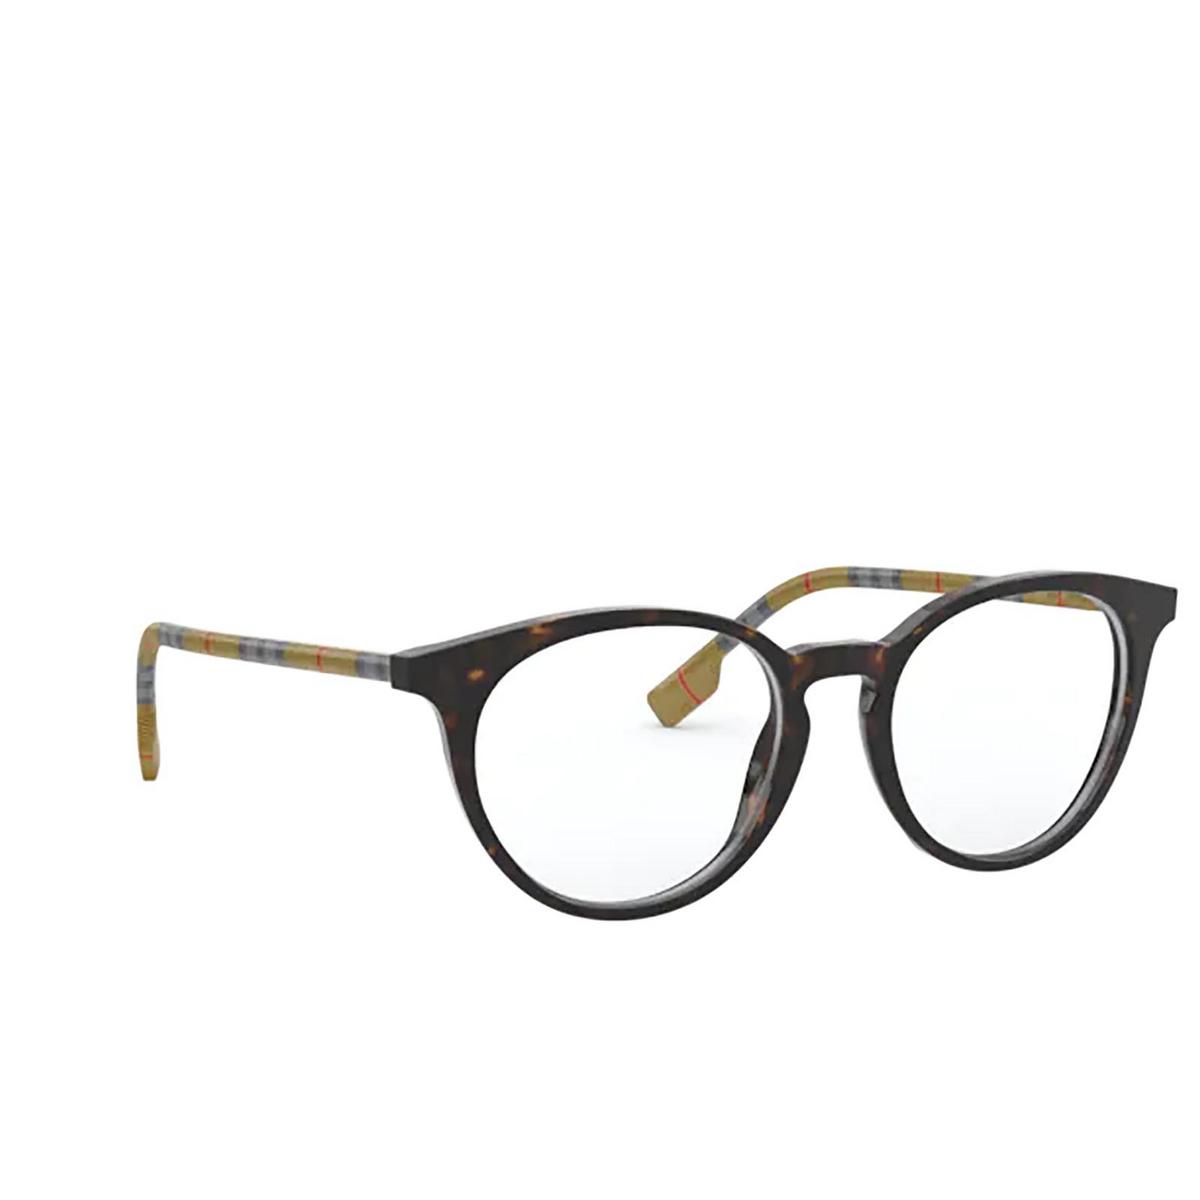 Burberry® Round Eyeglasses: Chalcot BE2318 color Dark Havana 3854 - three-quarters view.